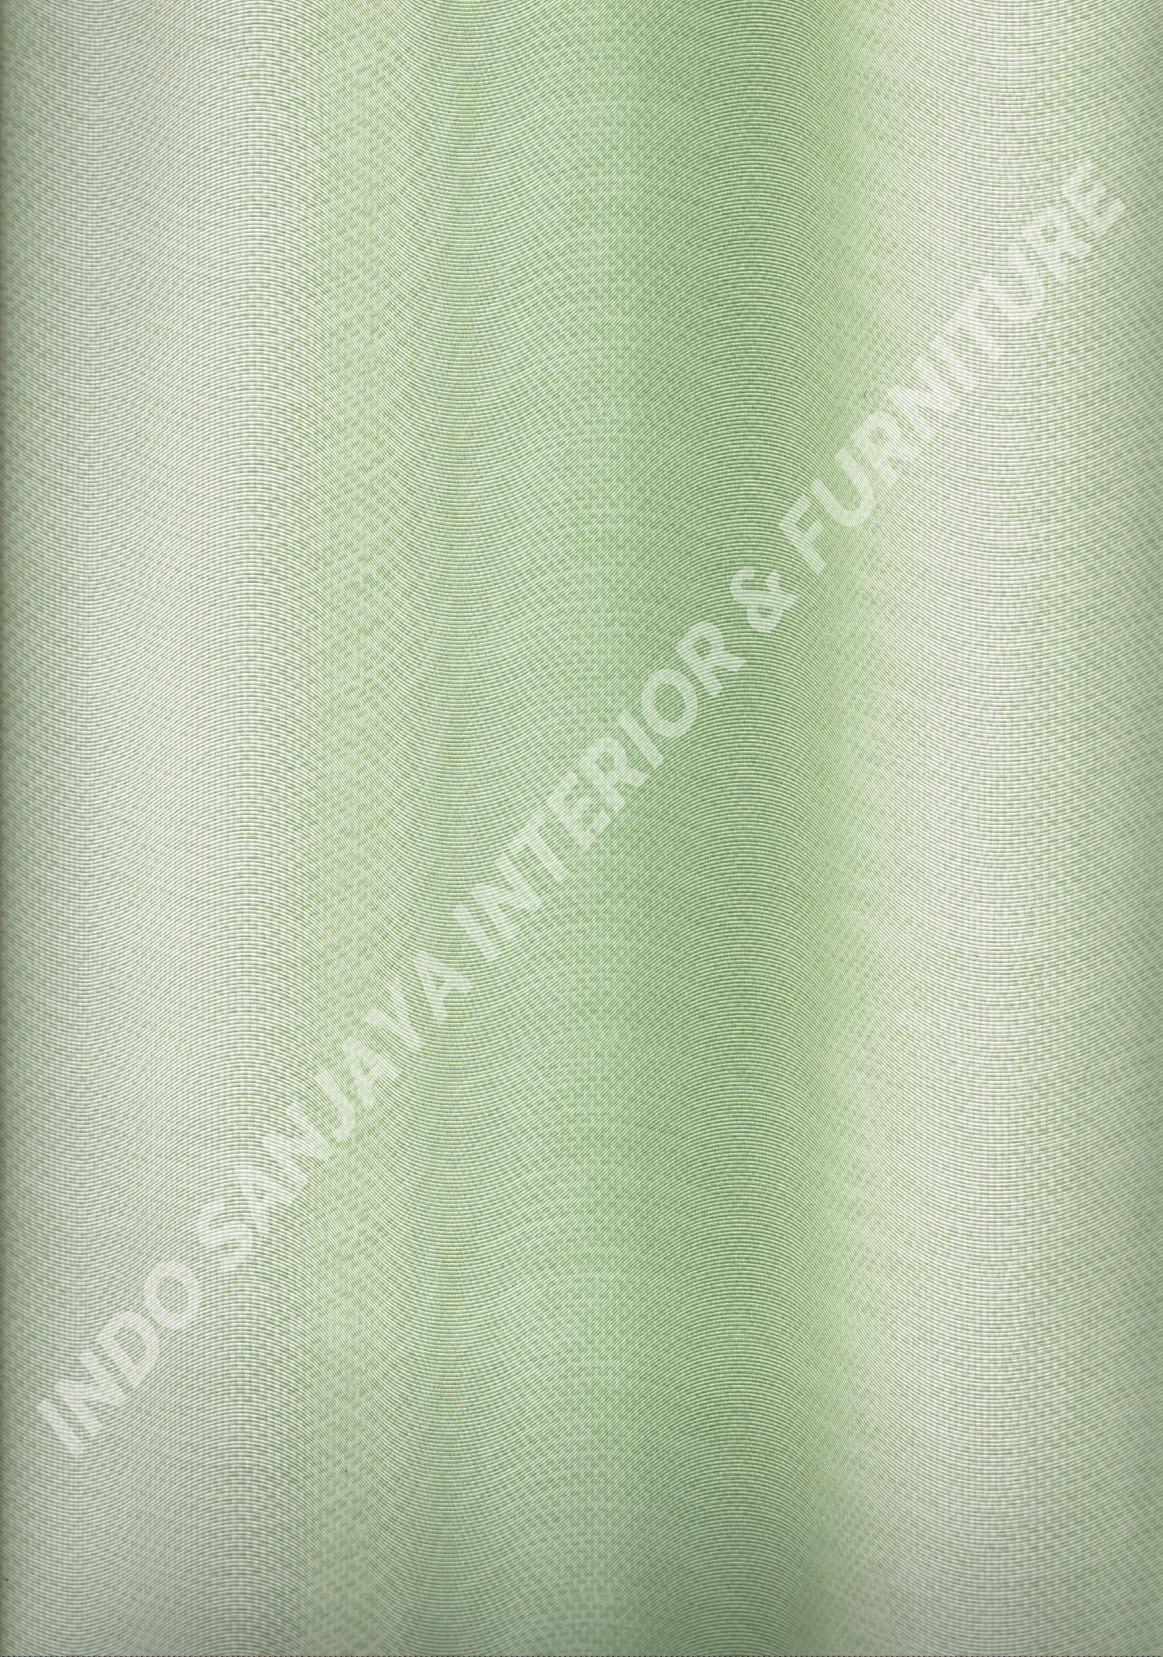 wallpaper   Wallpaper Minimalis Polos 2571-2:2571-2 corak  warna